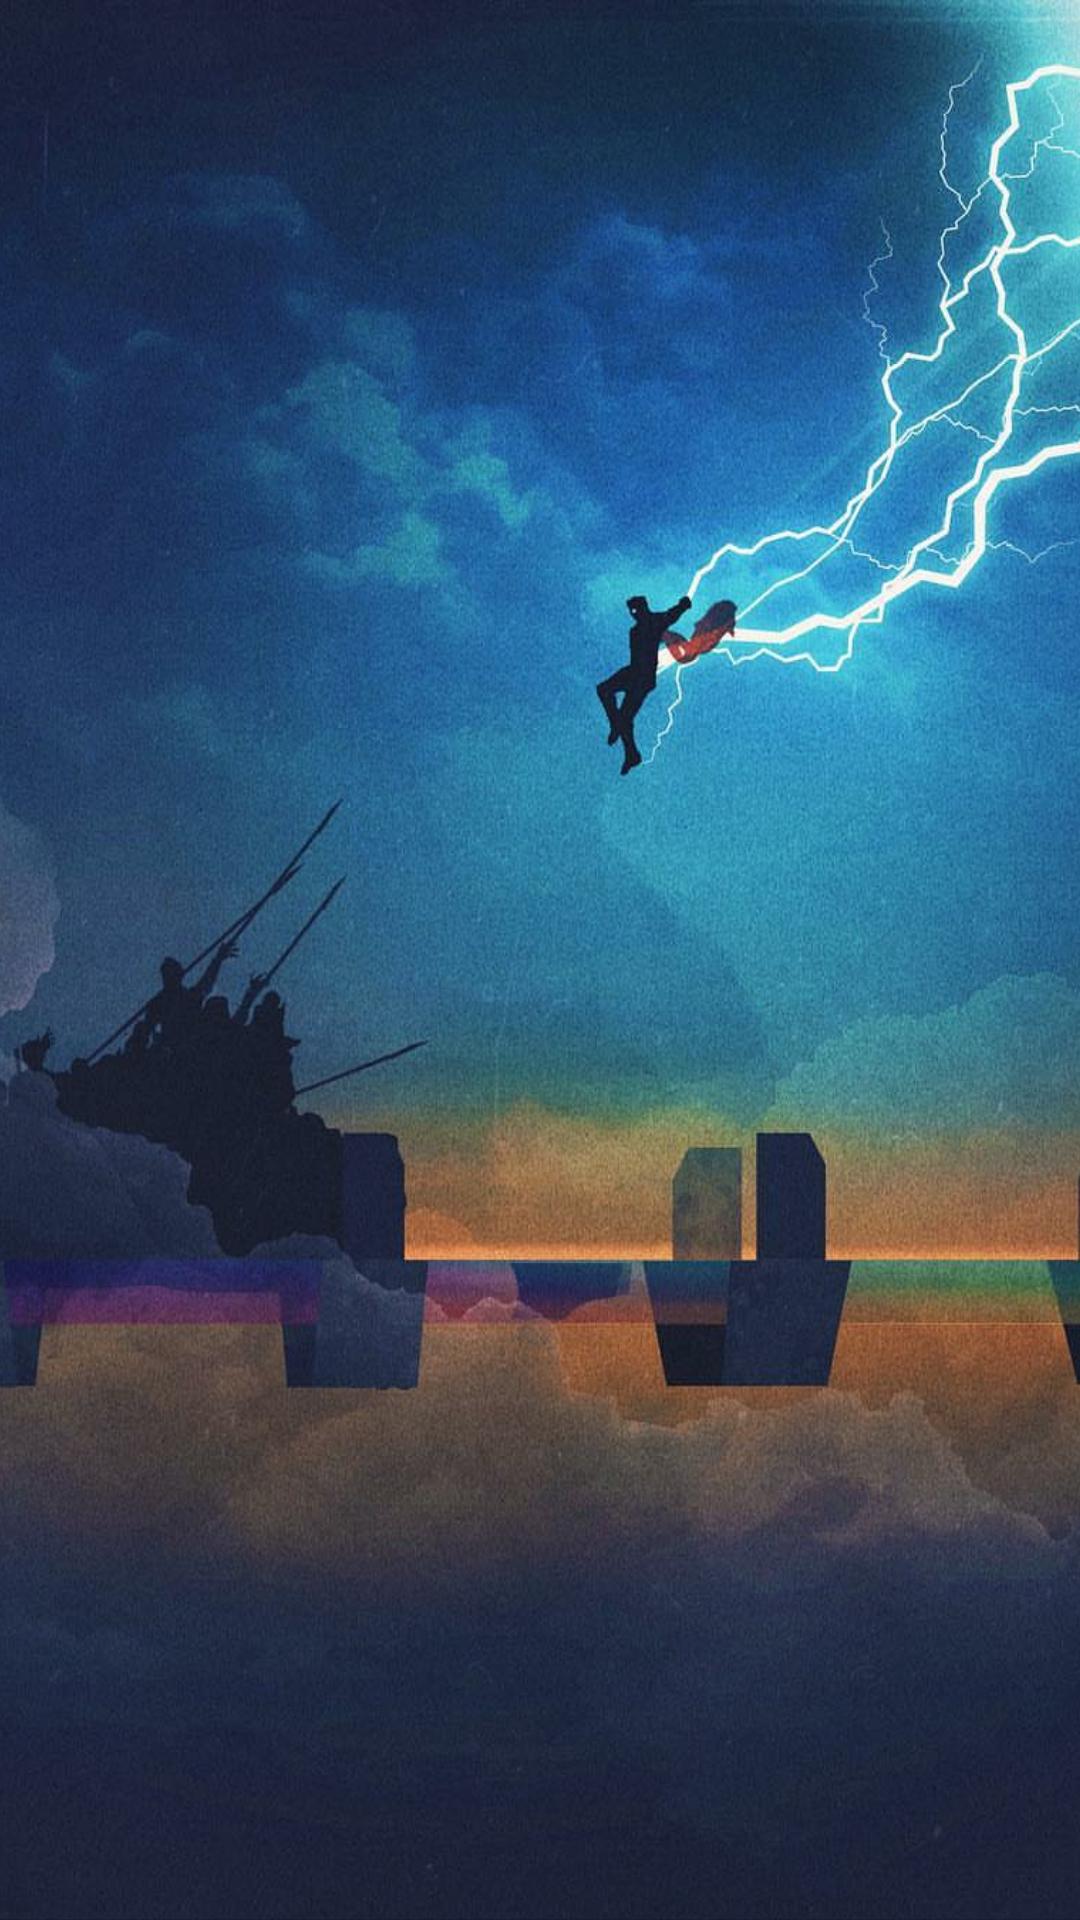 Thor Stormbreaker Iphone Wallpaper